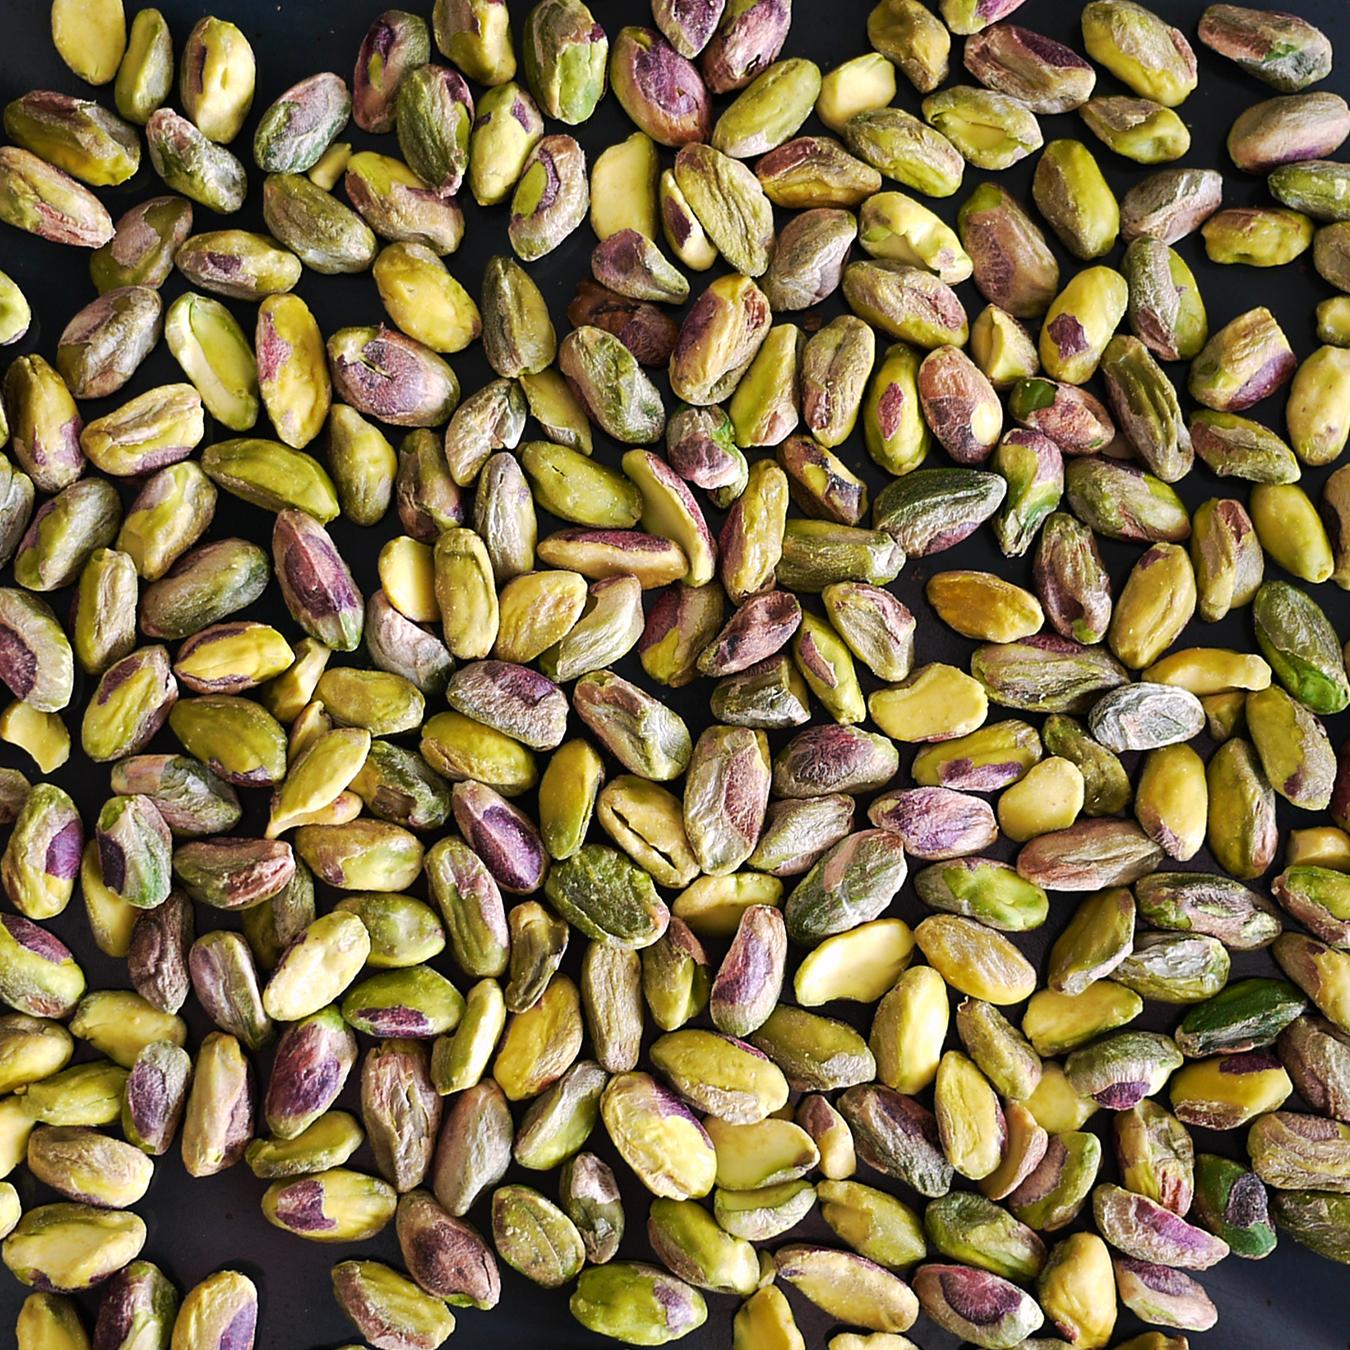 SO-SAVOURY-Nut-Butters-pistachios.jpg